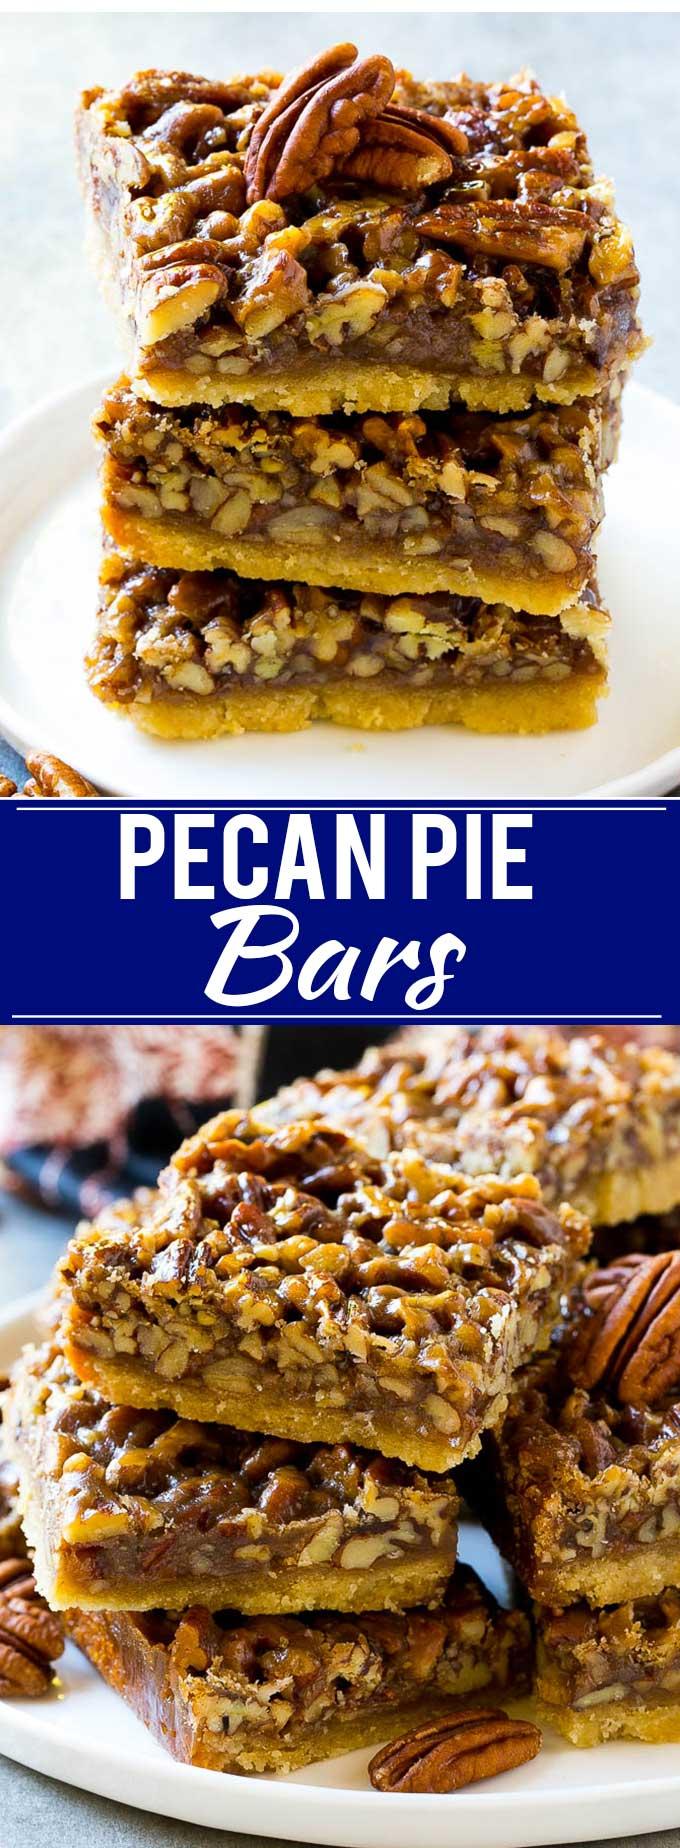 Pecan Pie Bars Recipe | Easy Pecan Pie Bars | Pecan Bars | Pecan Squares